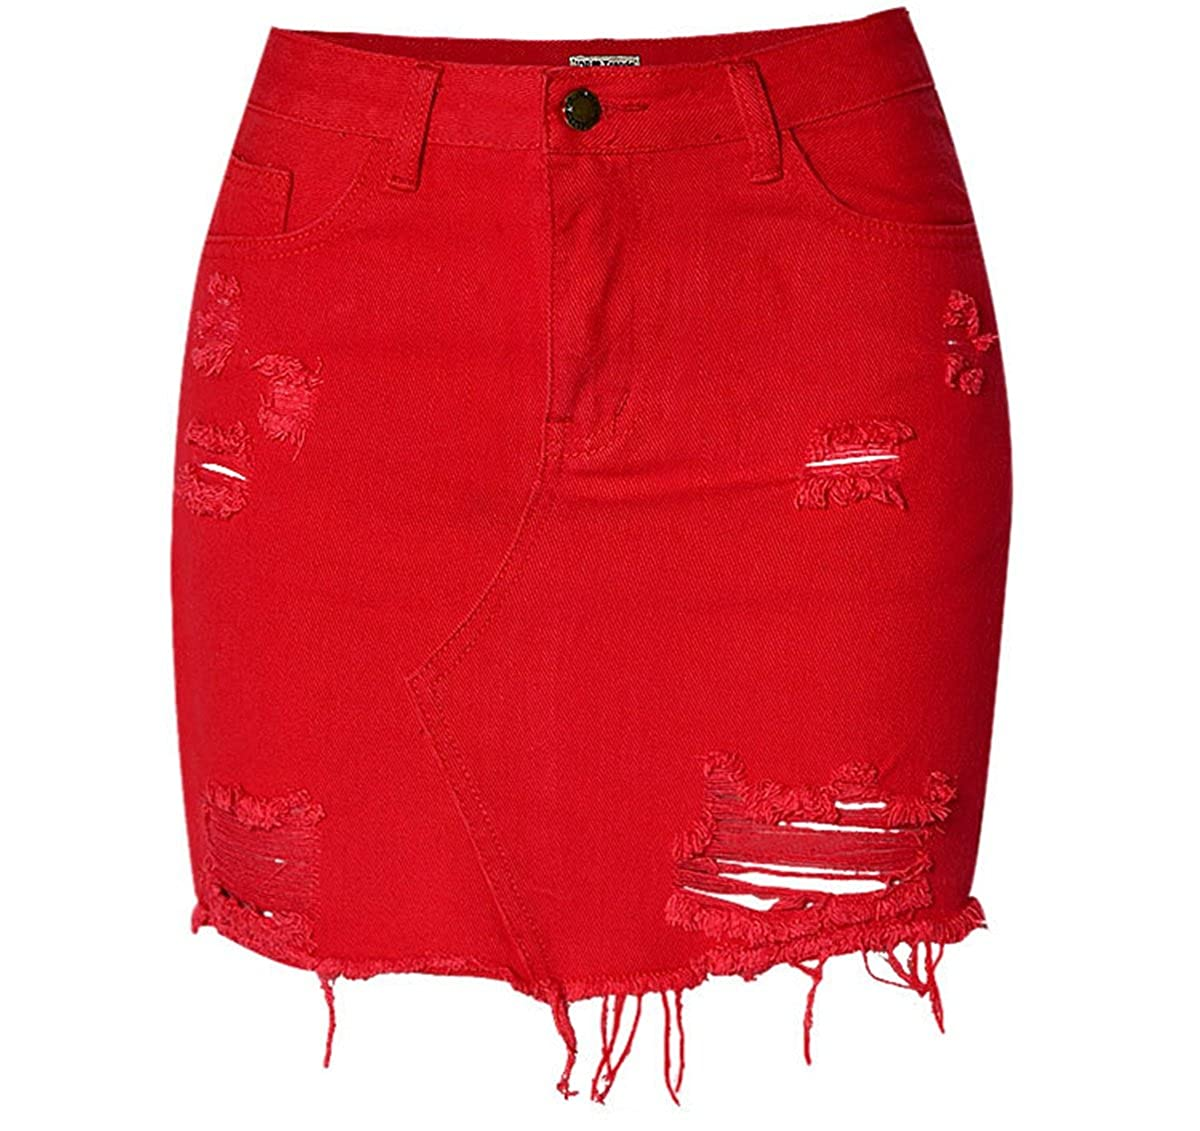 60938ab81 QINGFANG Women's Short Denim Skirt Women's Rip Denim Mini Skirt Red: Amazon. co.uk: Clothing